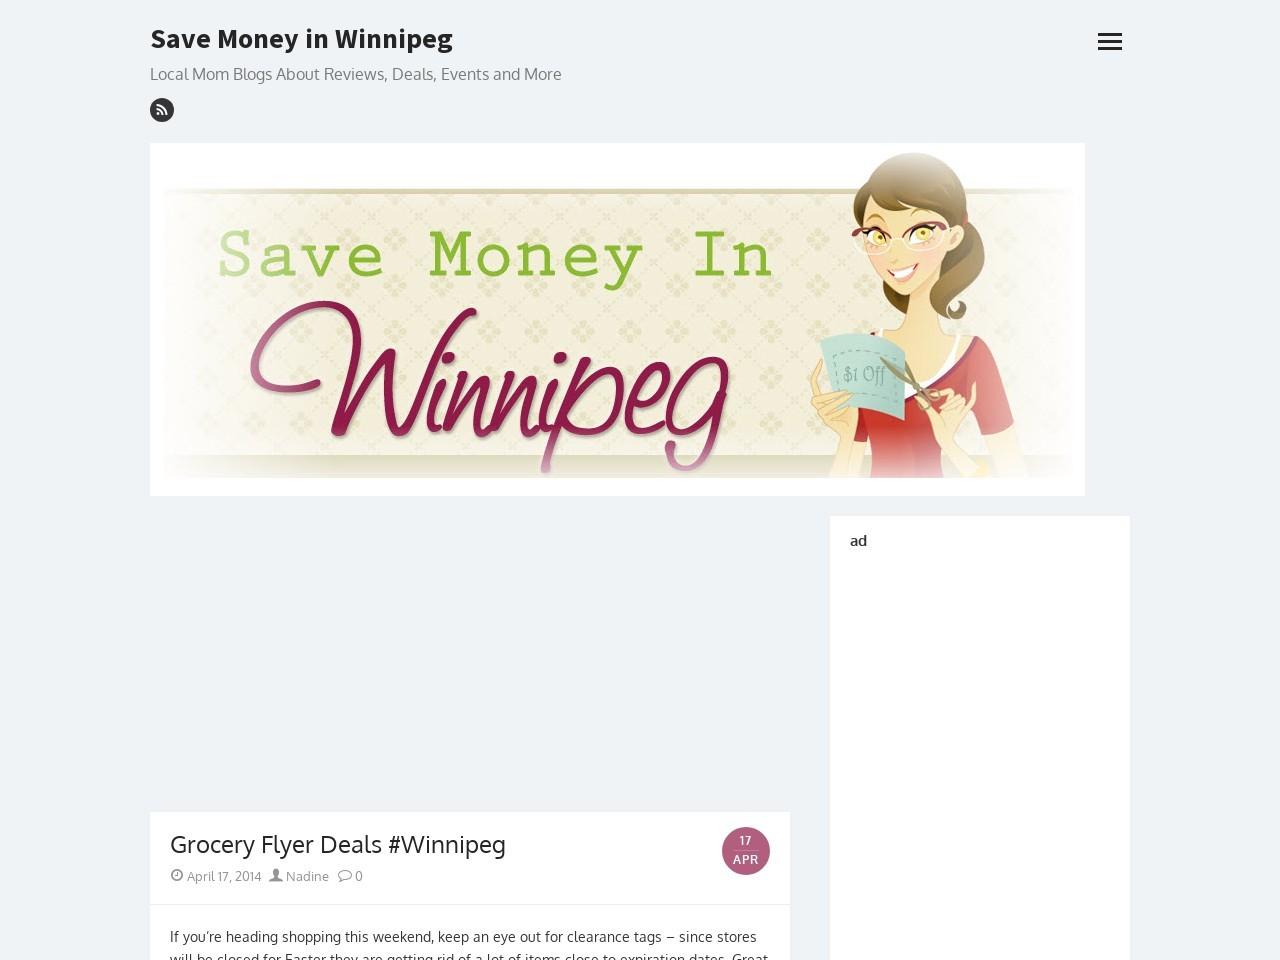 Grocery Flyer Deals #Winnipeg